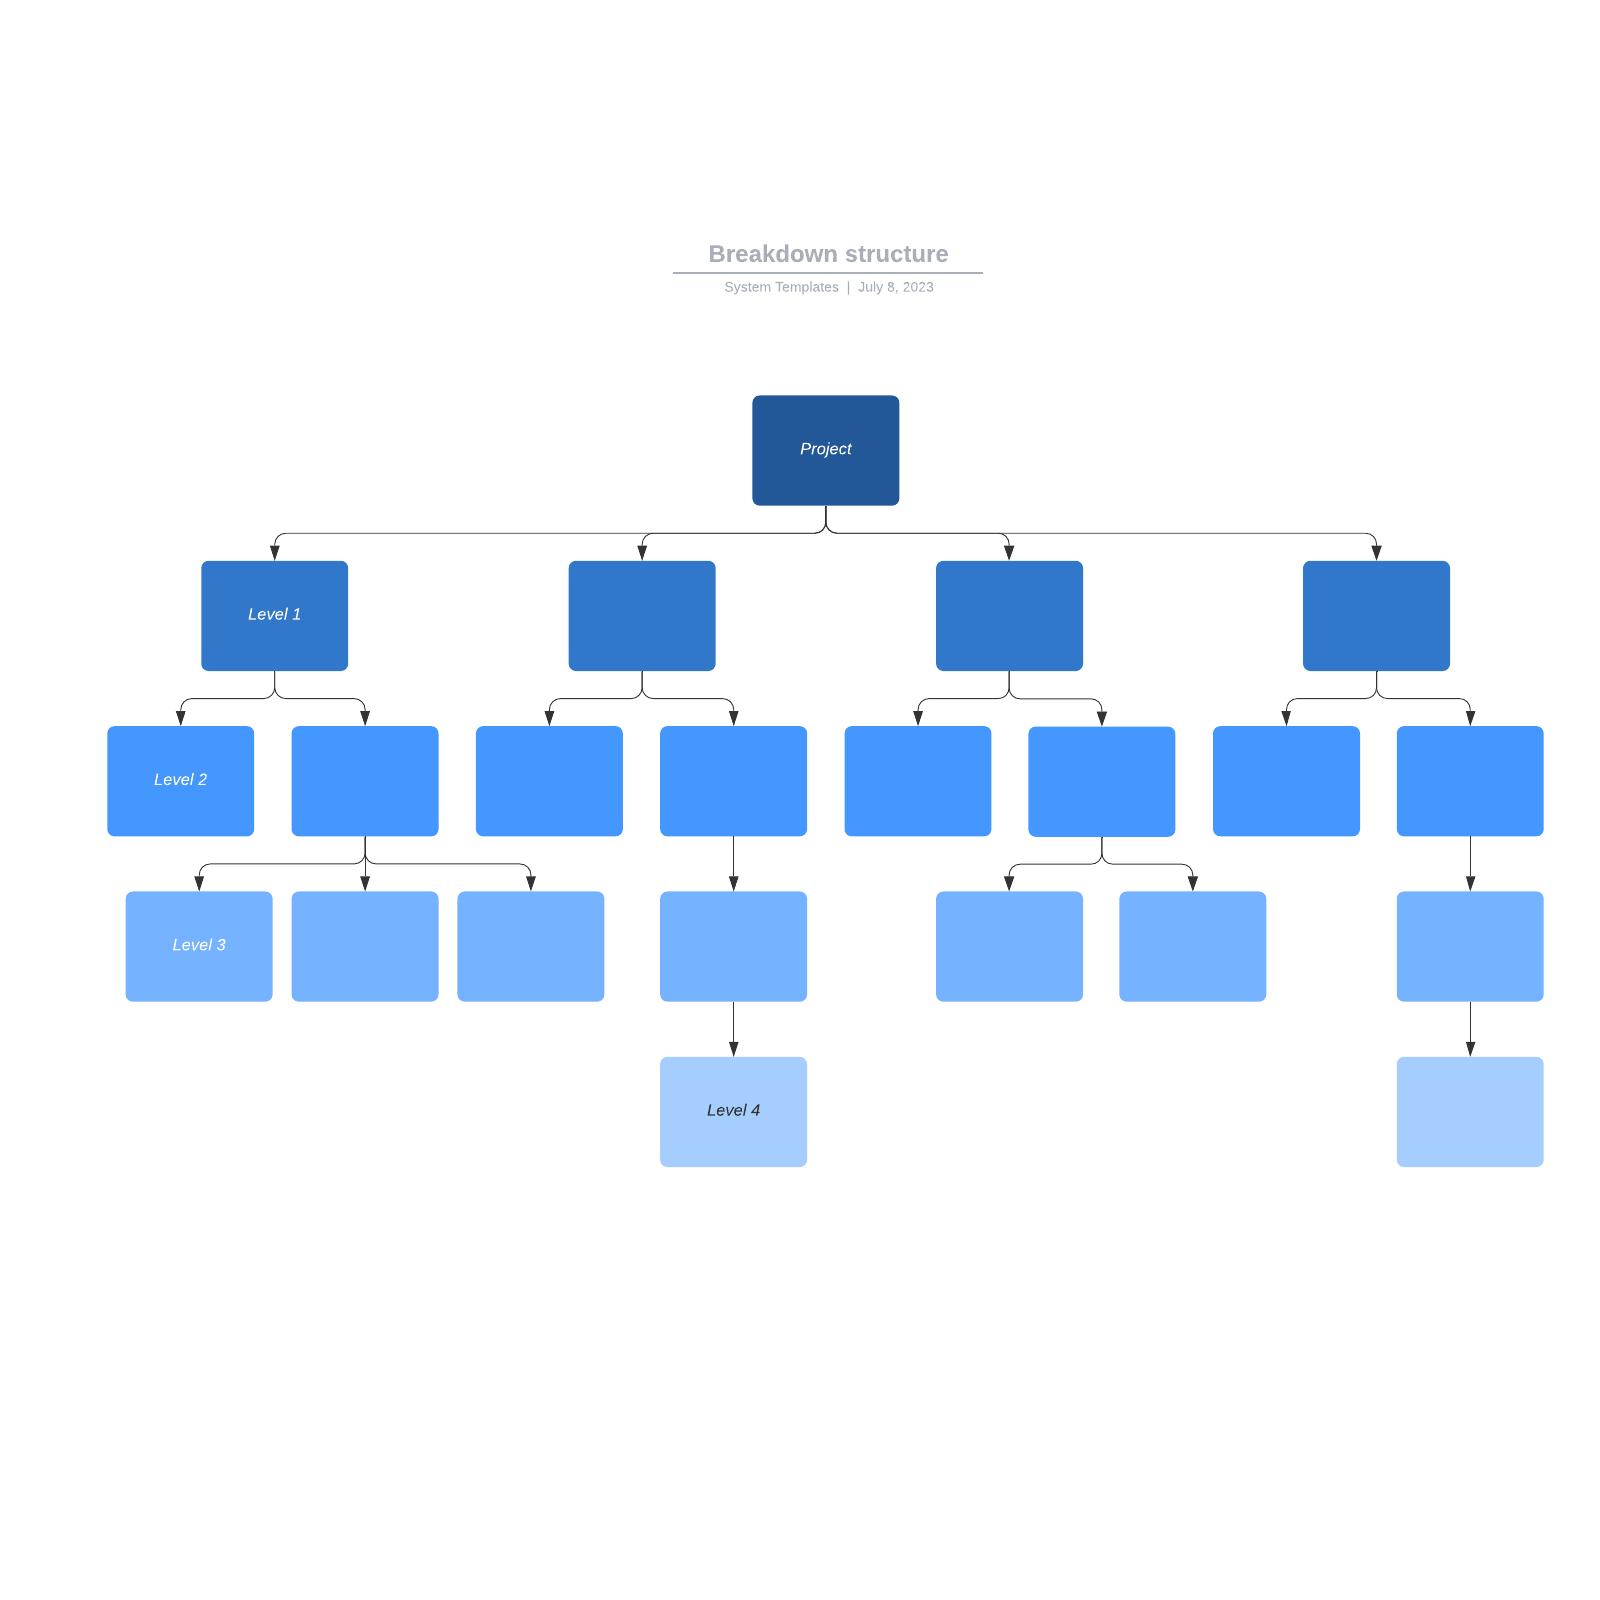 Breakdown structure